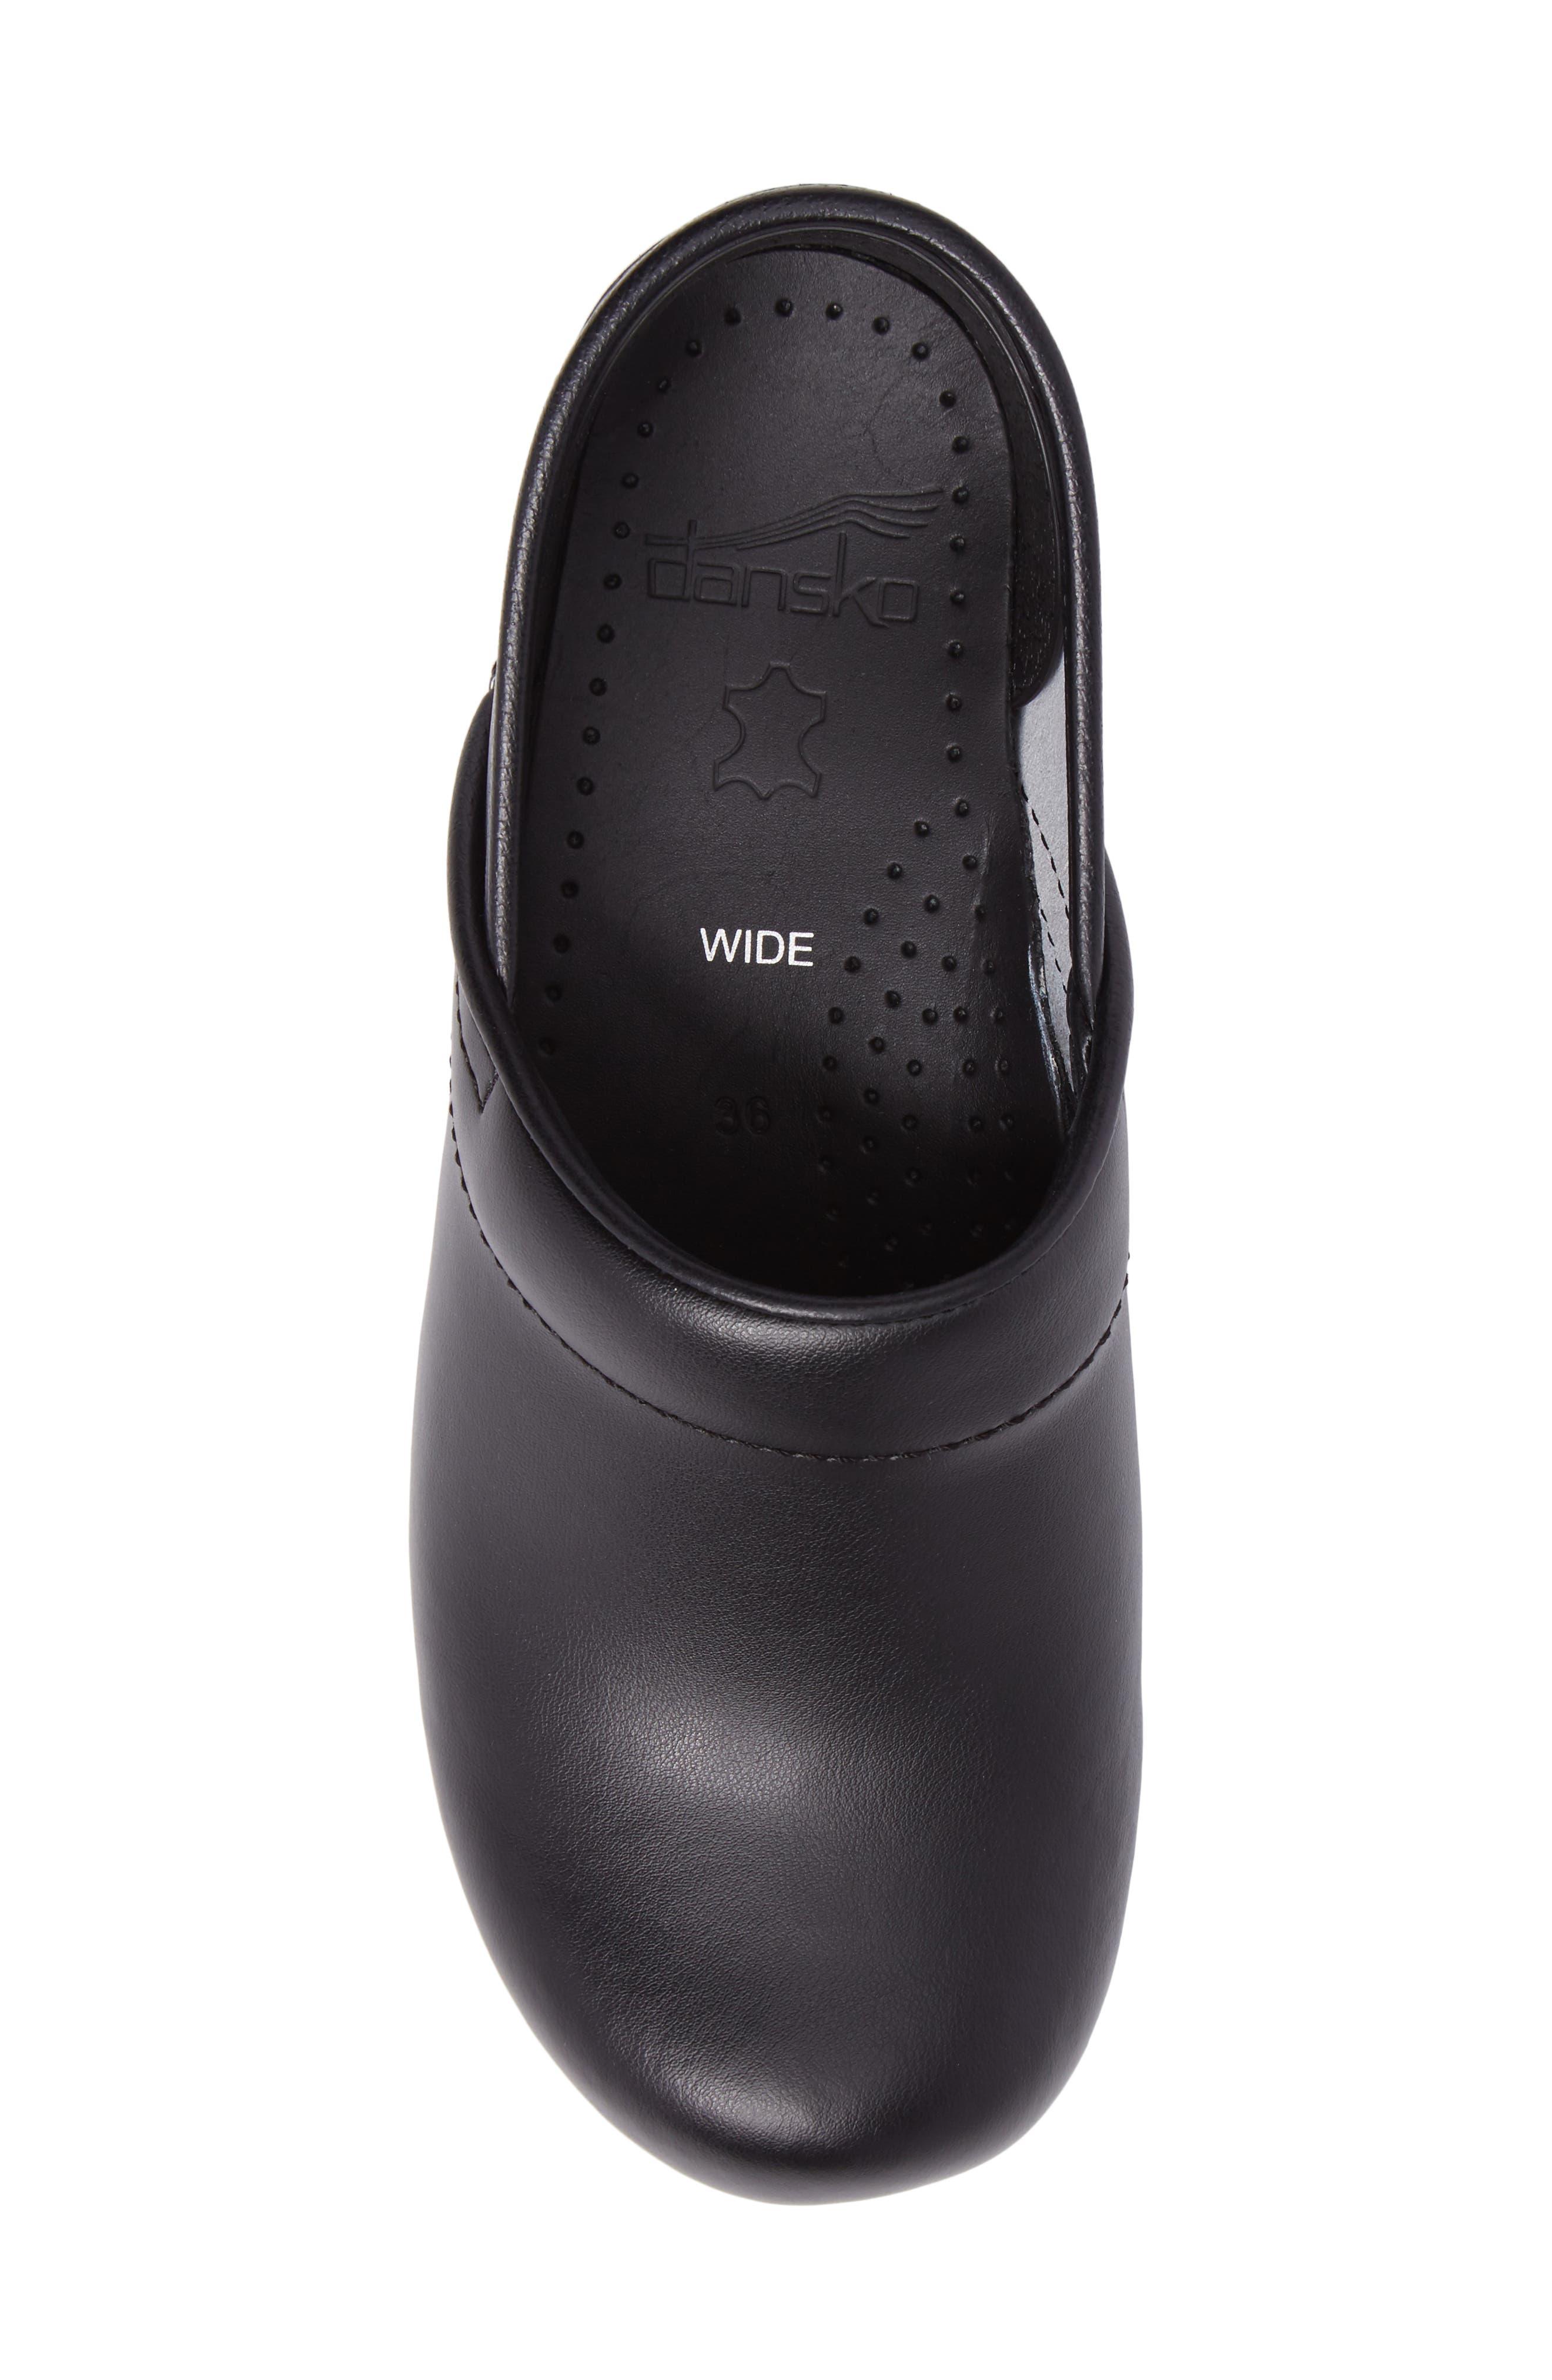 Wide Pro Clog,                             Alternate thumbnail 5, color,                             BLACK BOX LEATHER